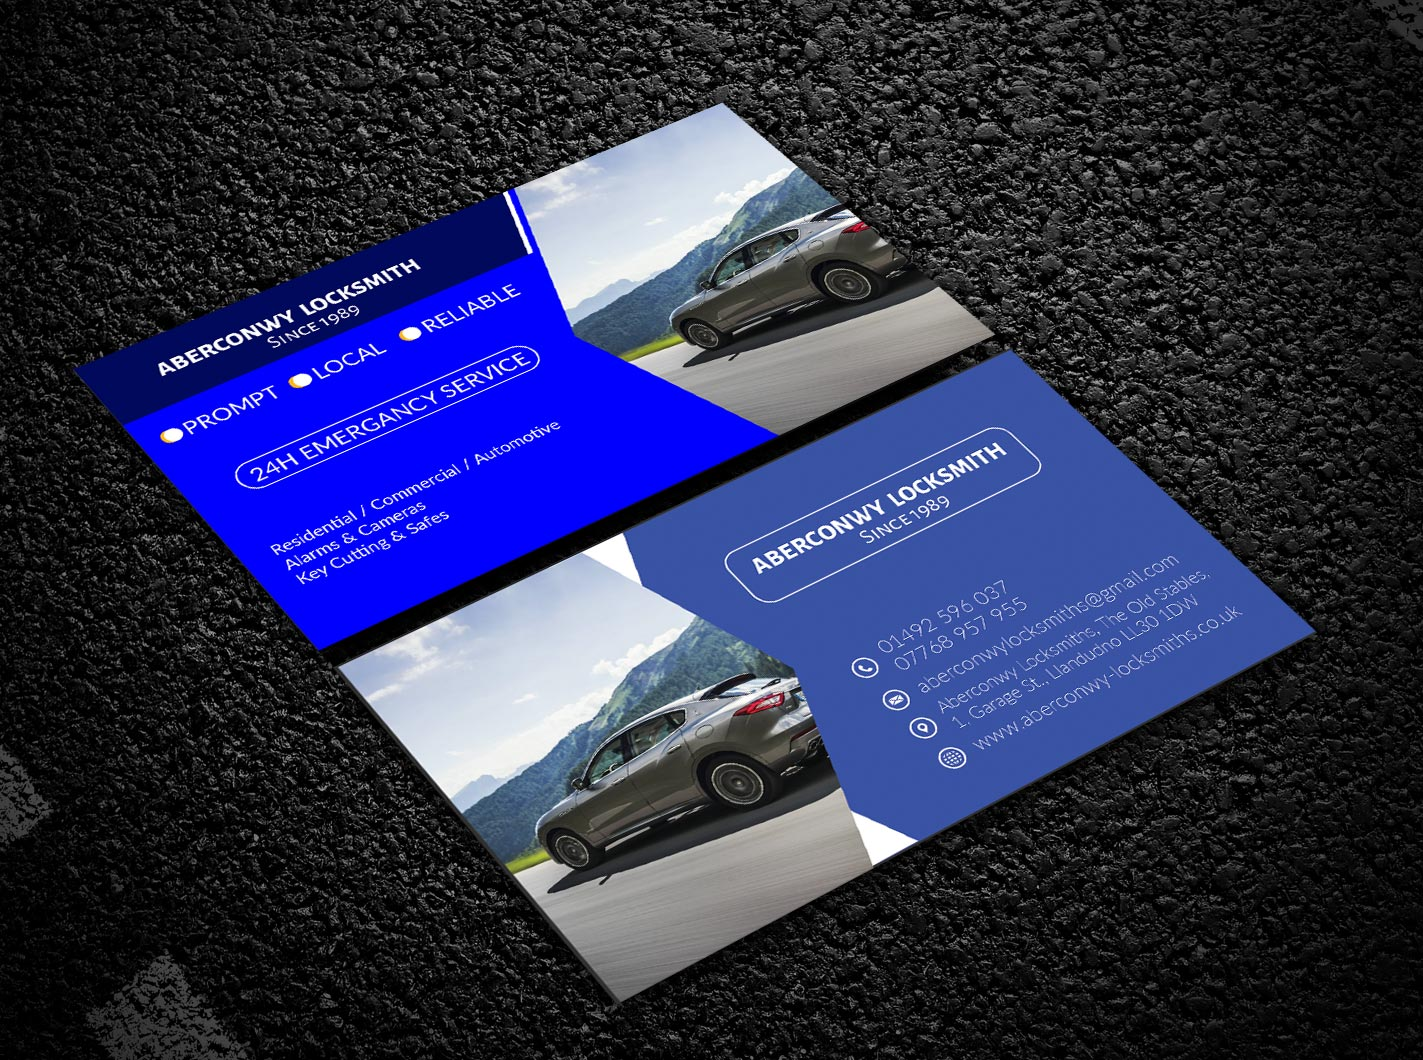 Elegant Playful Locksmith Business Card Design For A Company By Atiq 2 Design 21915534